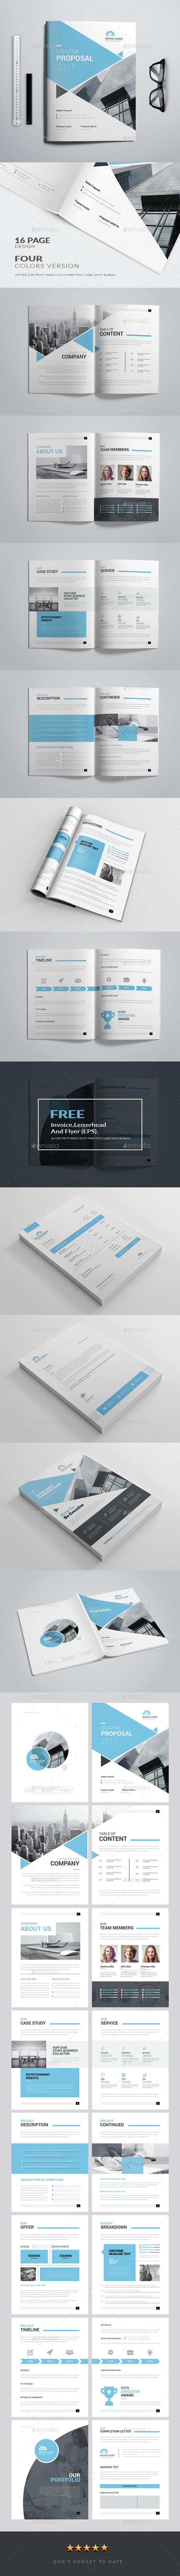 GraphicRiver Proposal 20691324